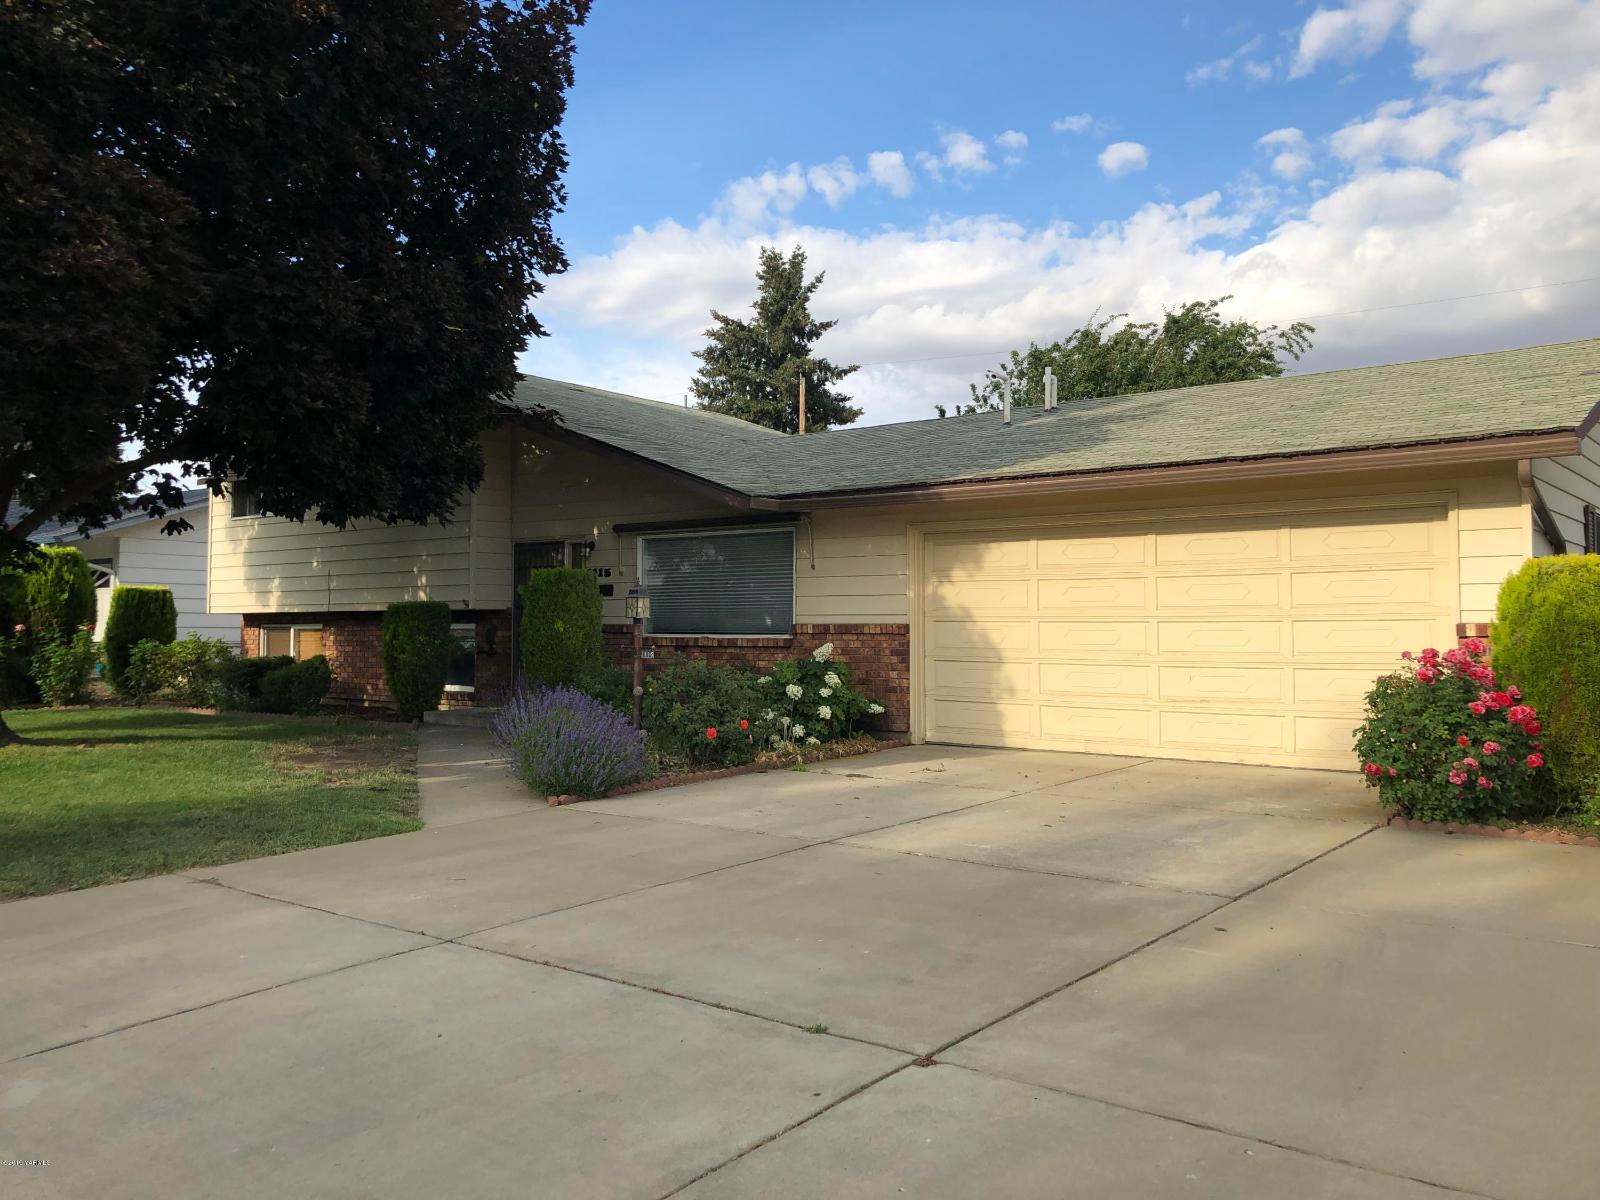 Local Real Estate: Homes for Sale — Yakima, WA — Coldwell Banker